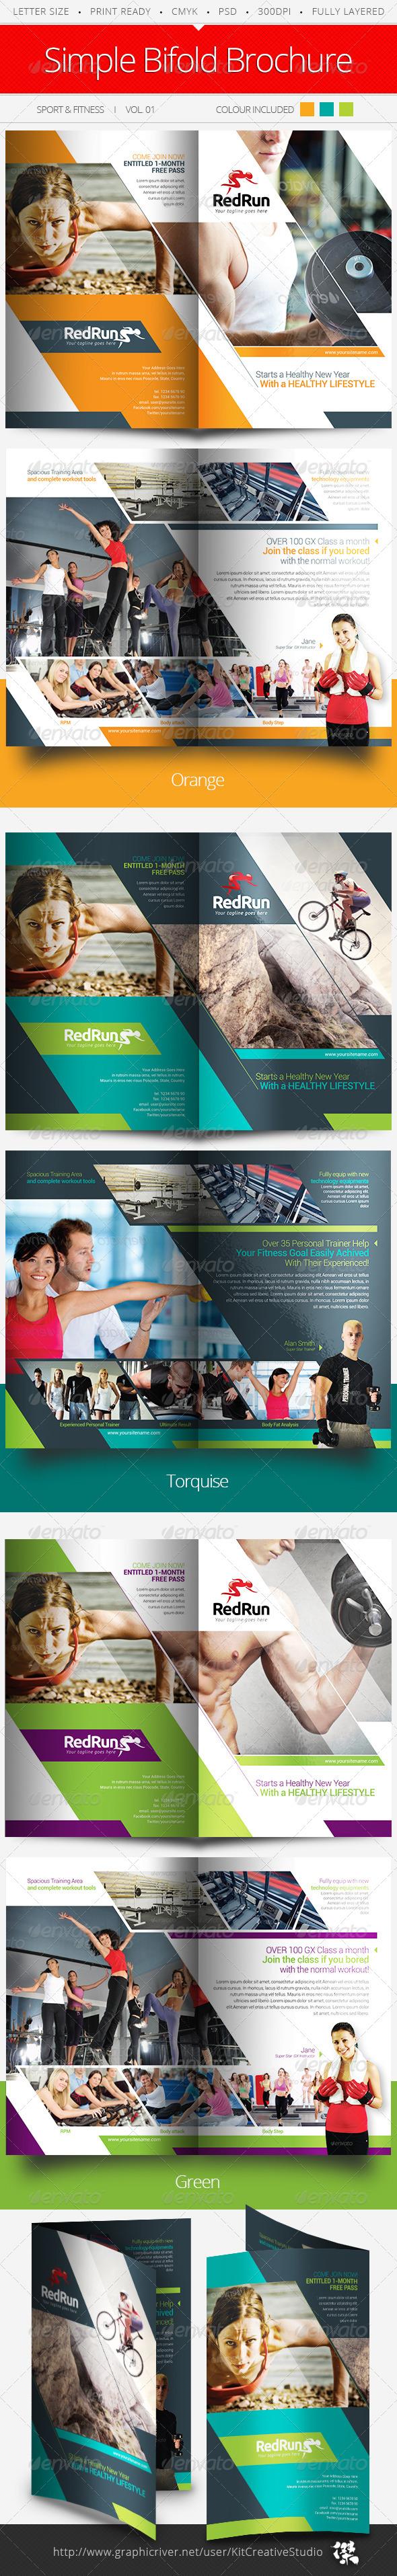 Sport & Fitness Bifold Brochure Vol.01 - Brochures Print Templates